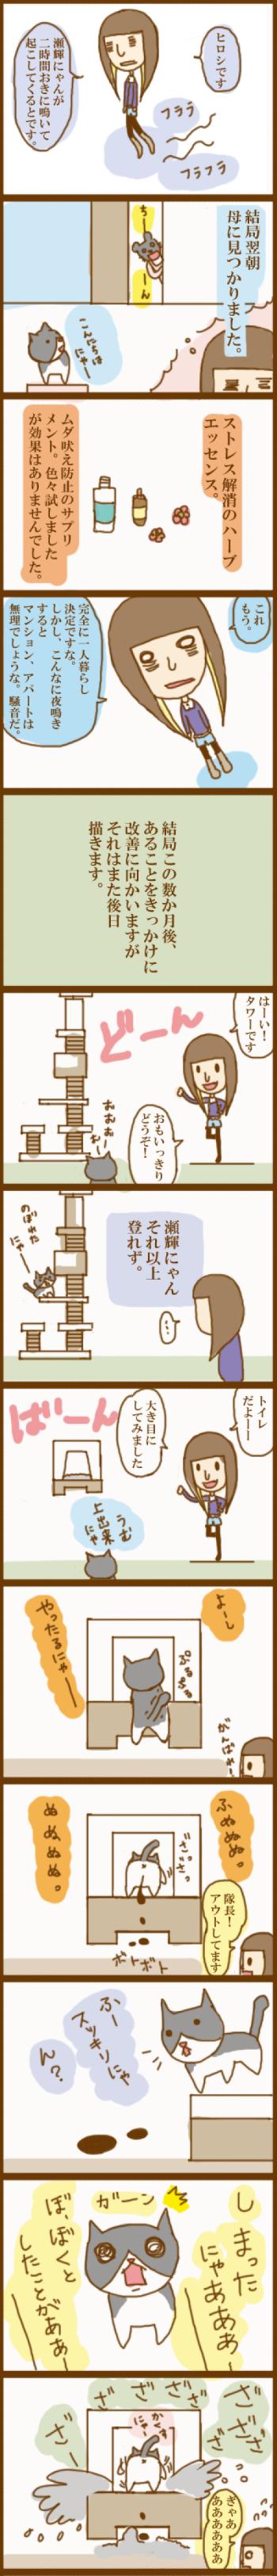 f:id:suzuokayu:20201011200019j:plain